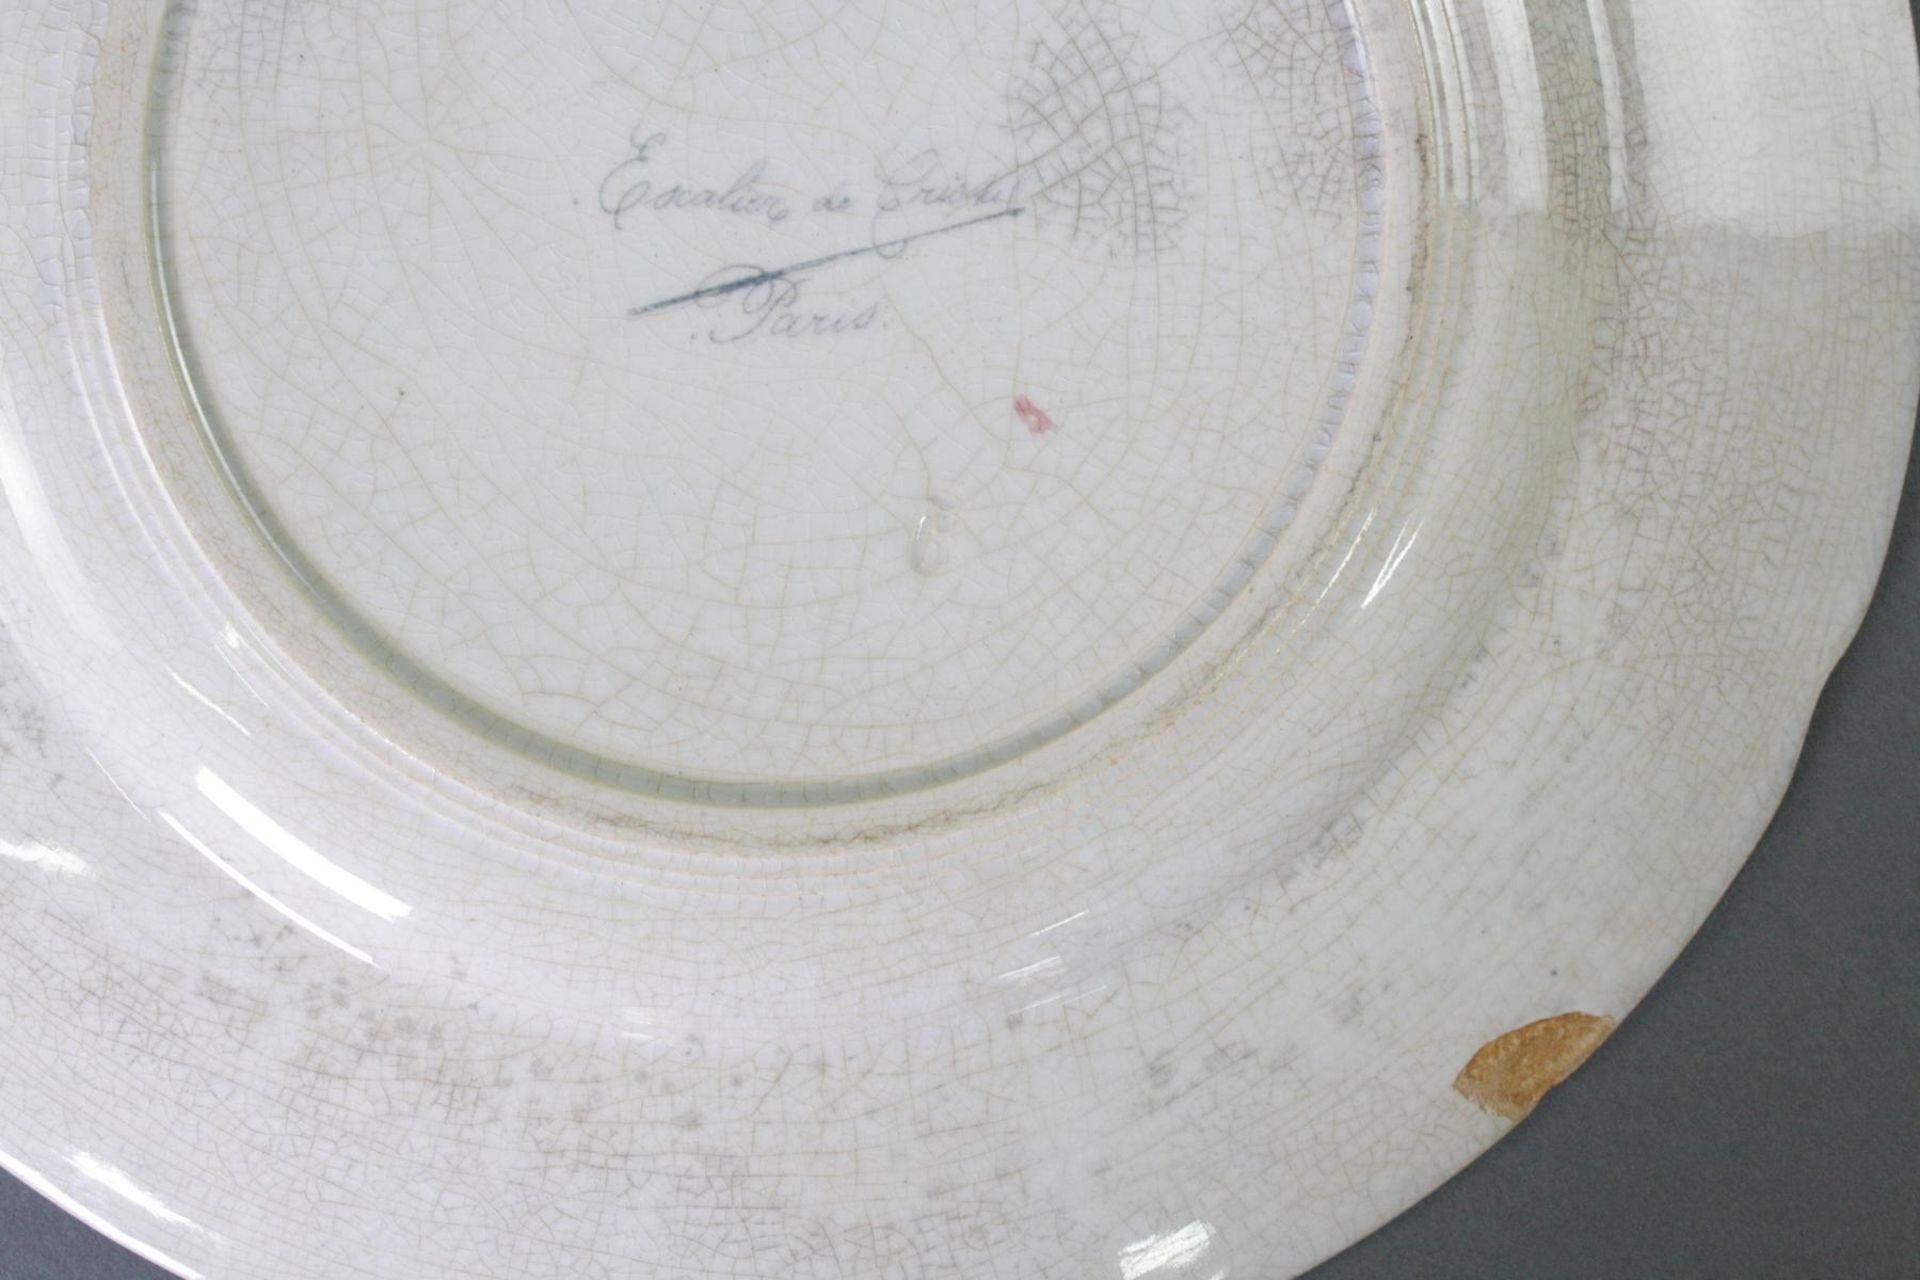 5 Keramikteller, Escalier de Cristal Paris - Bild 4 aus 4